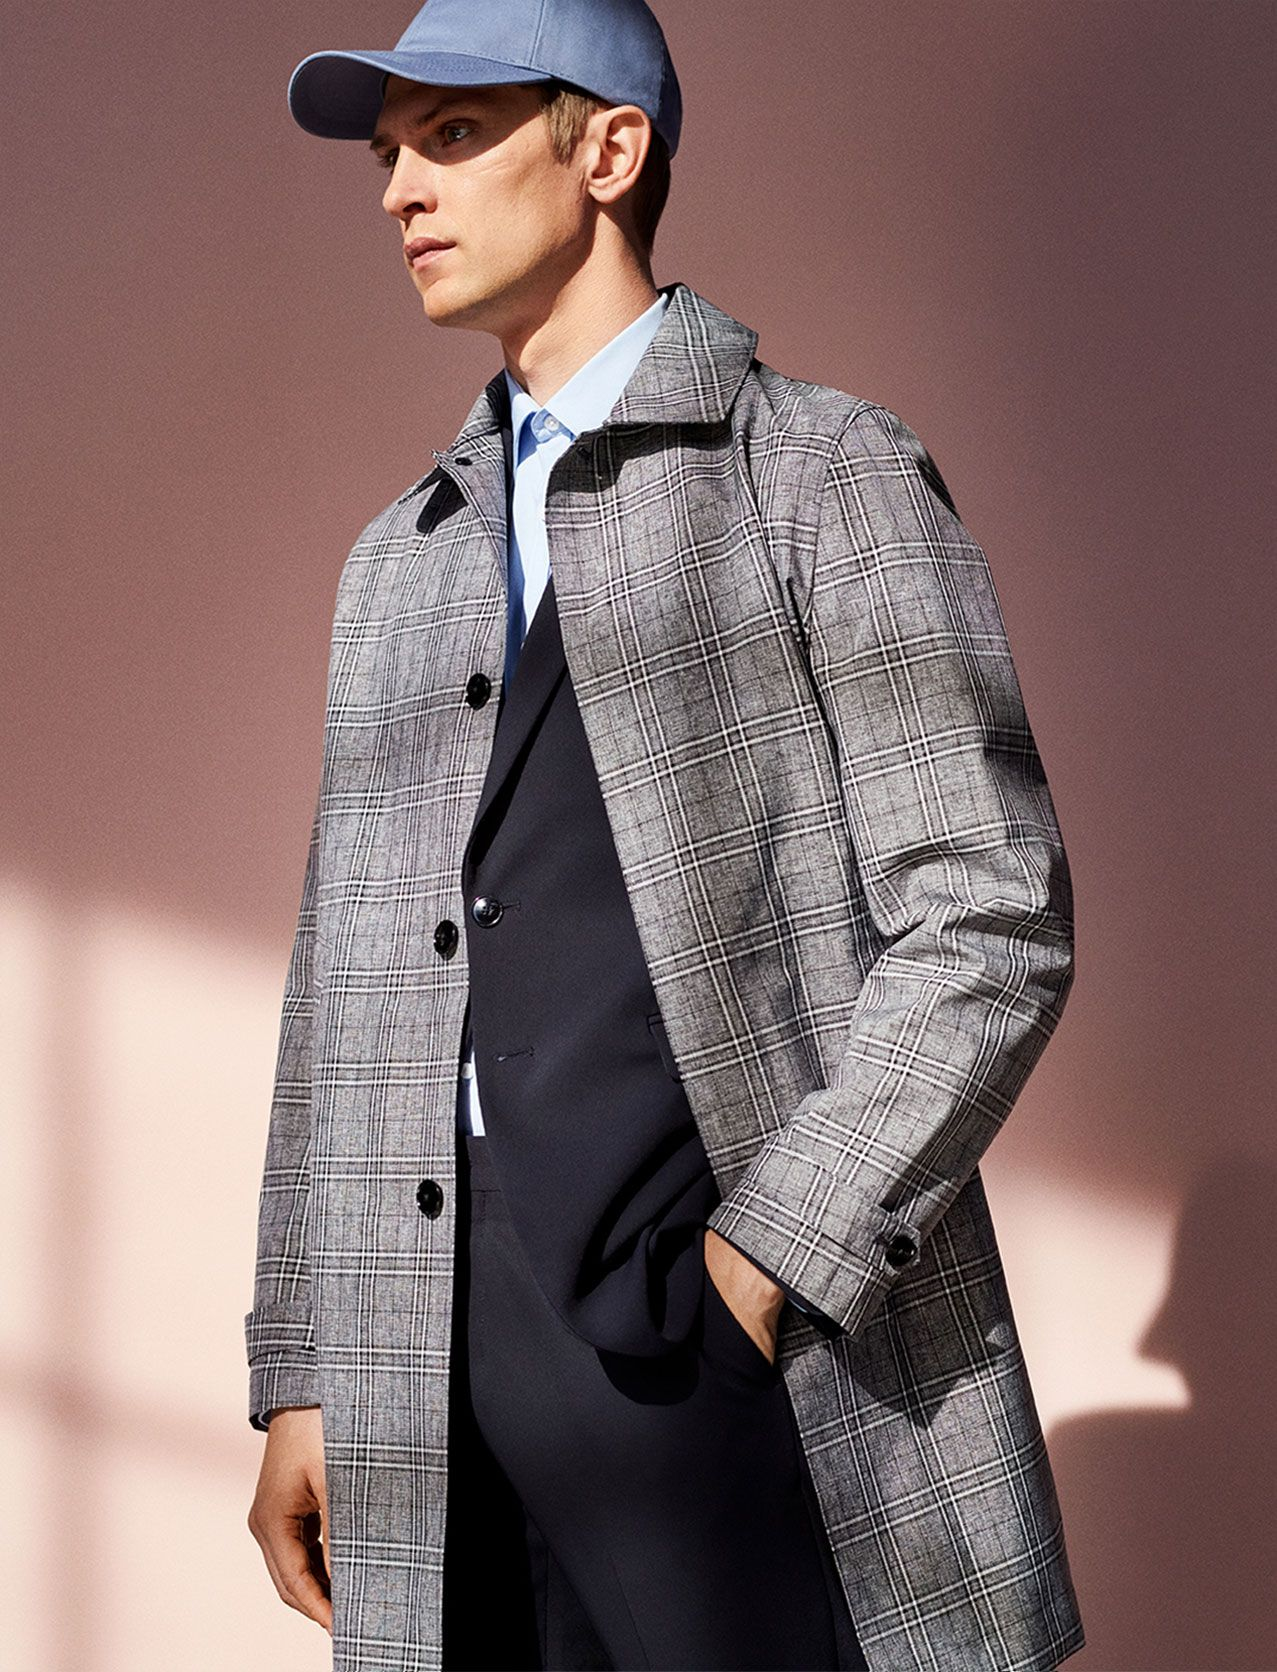 Image 2 Of Plaid Traveler Trench Coat Traveler Suit